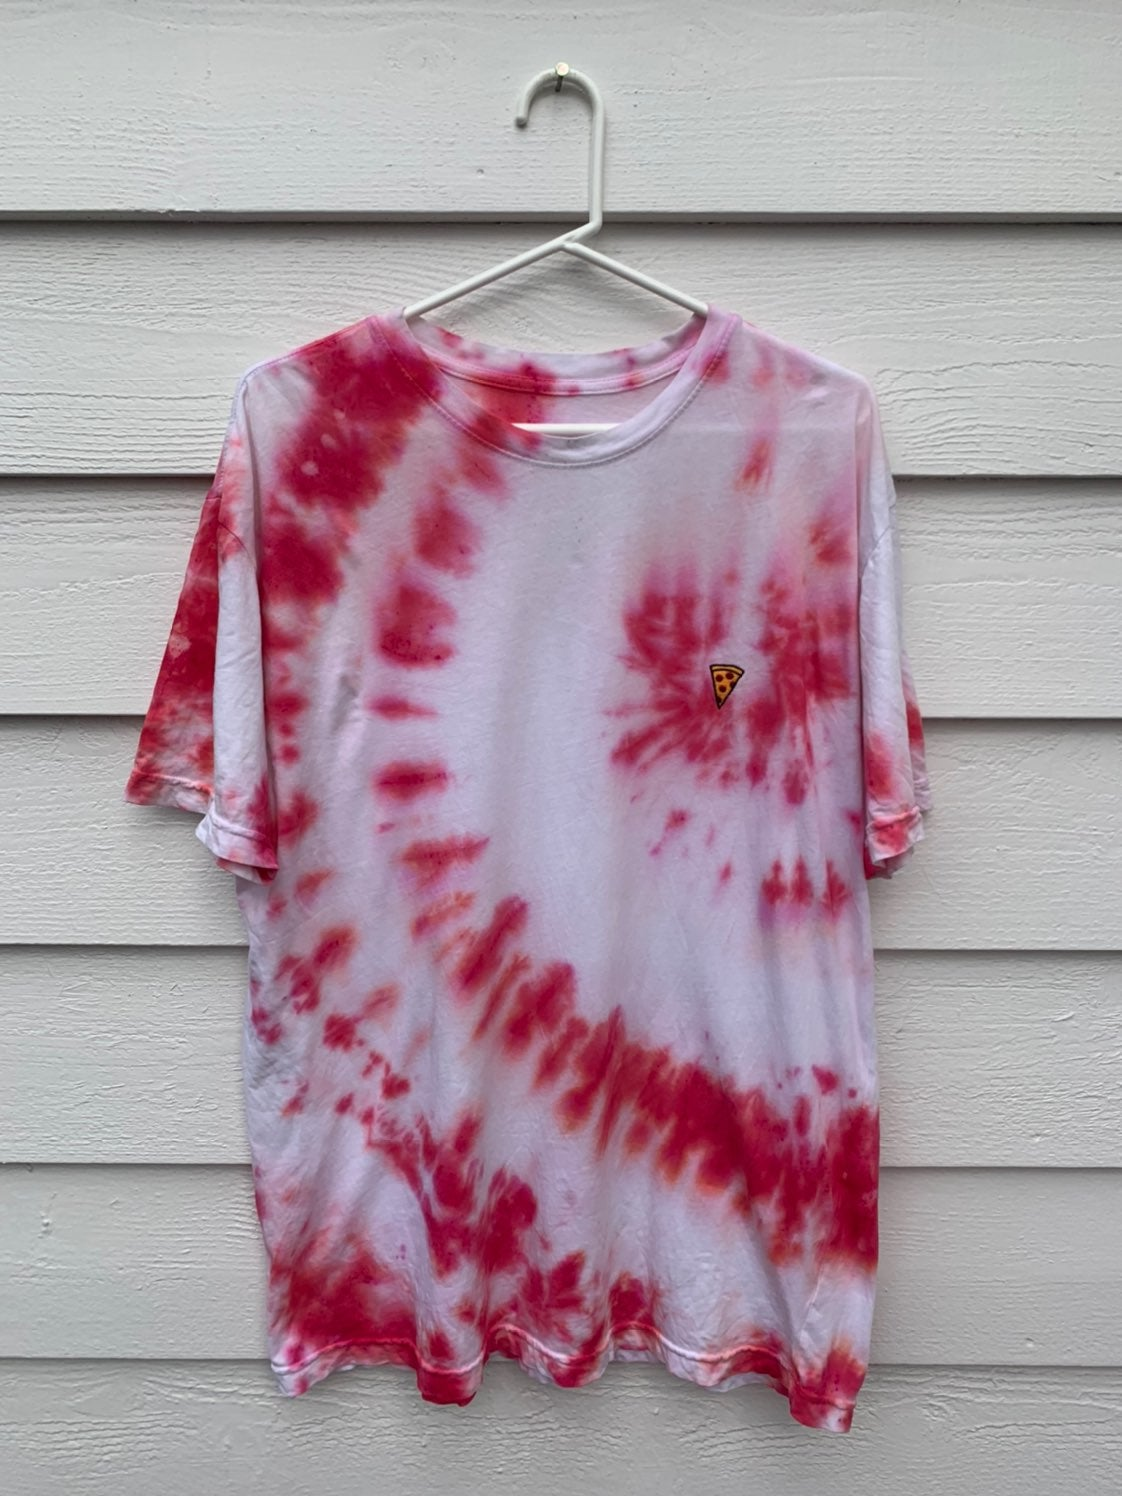 Custom tie dye pizza shirt - Large